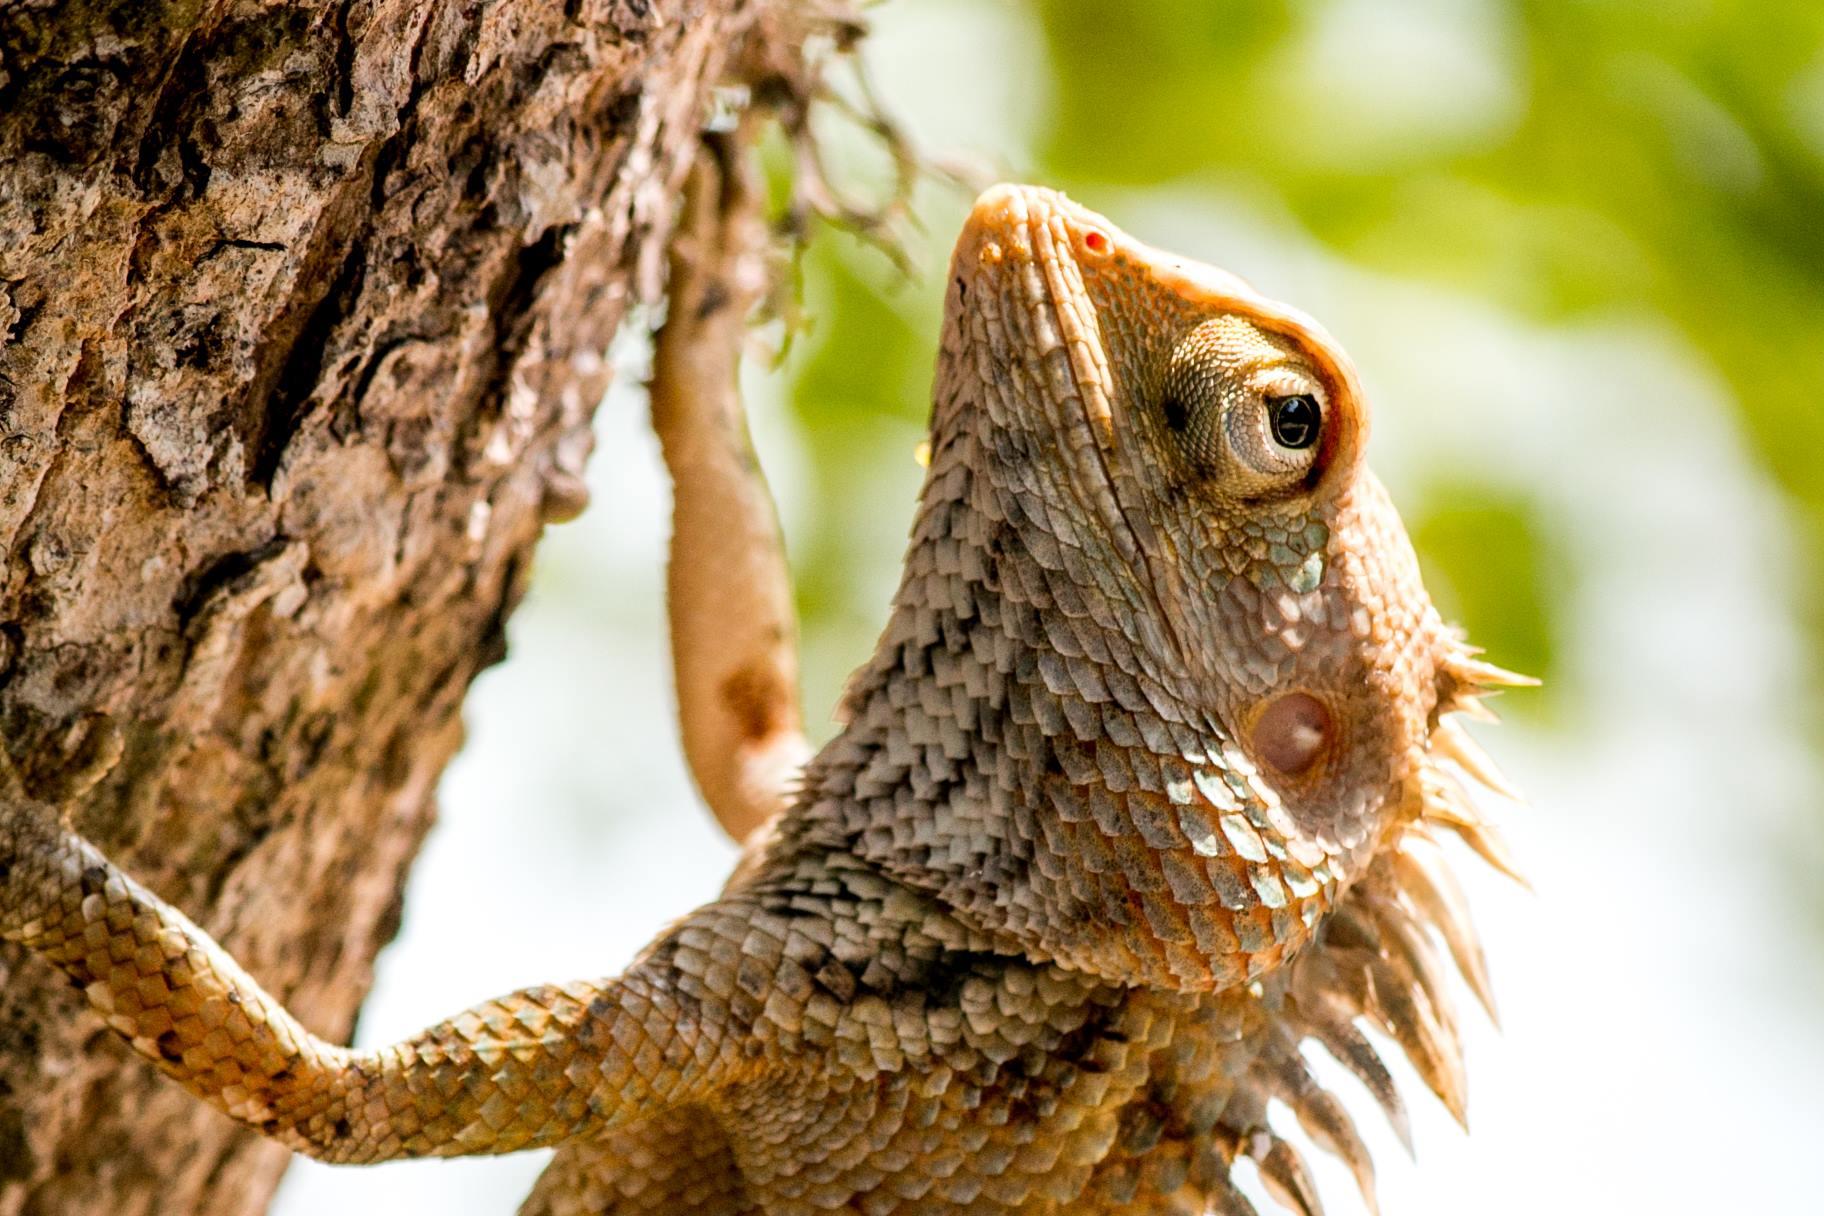 invite-to-paradise-sri-lanka-and-maldives-specialists-travel-agent-tour-operator-customer-review-feedback-joel-rhian-lizard-2.jpg